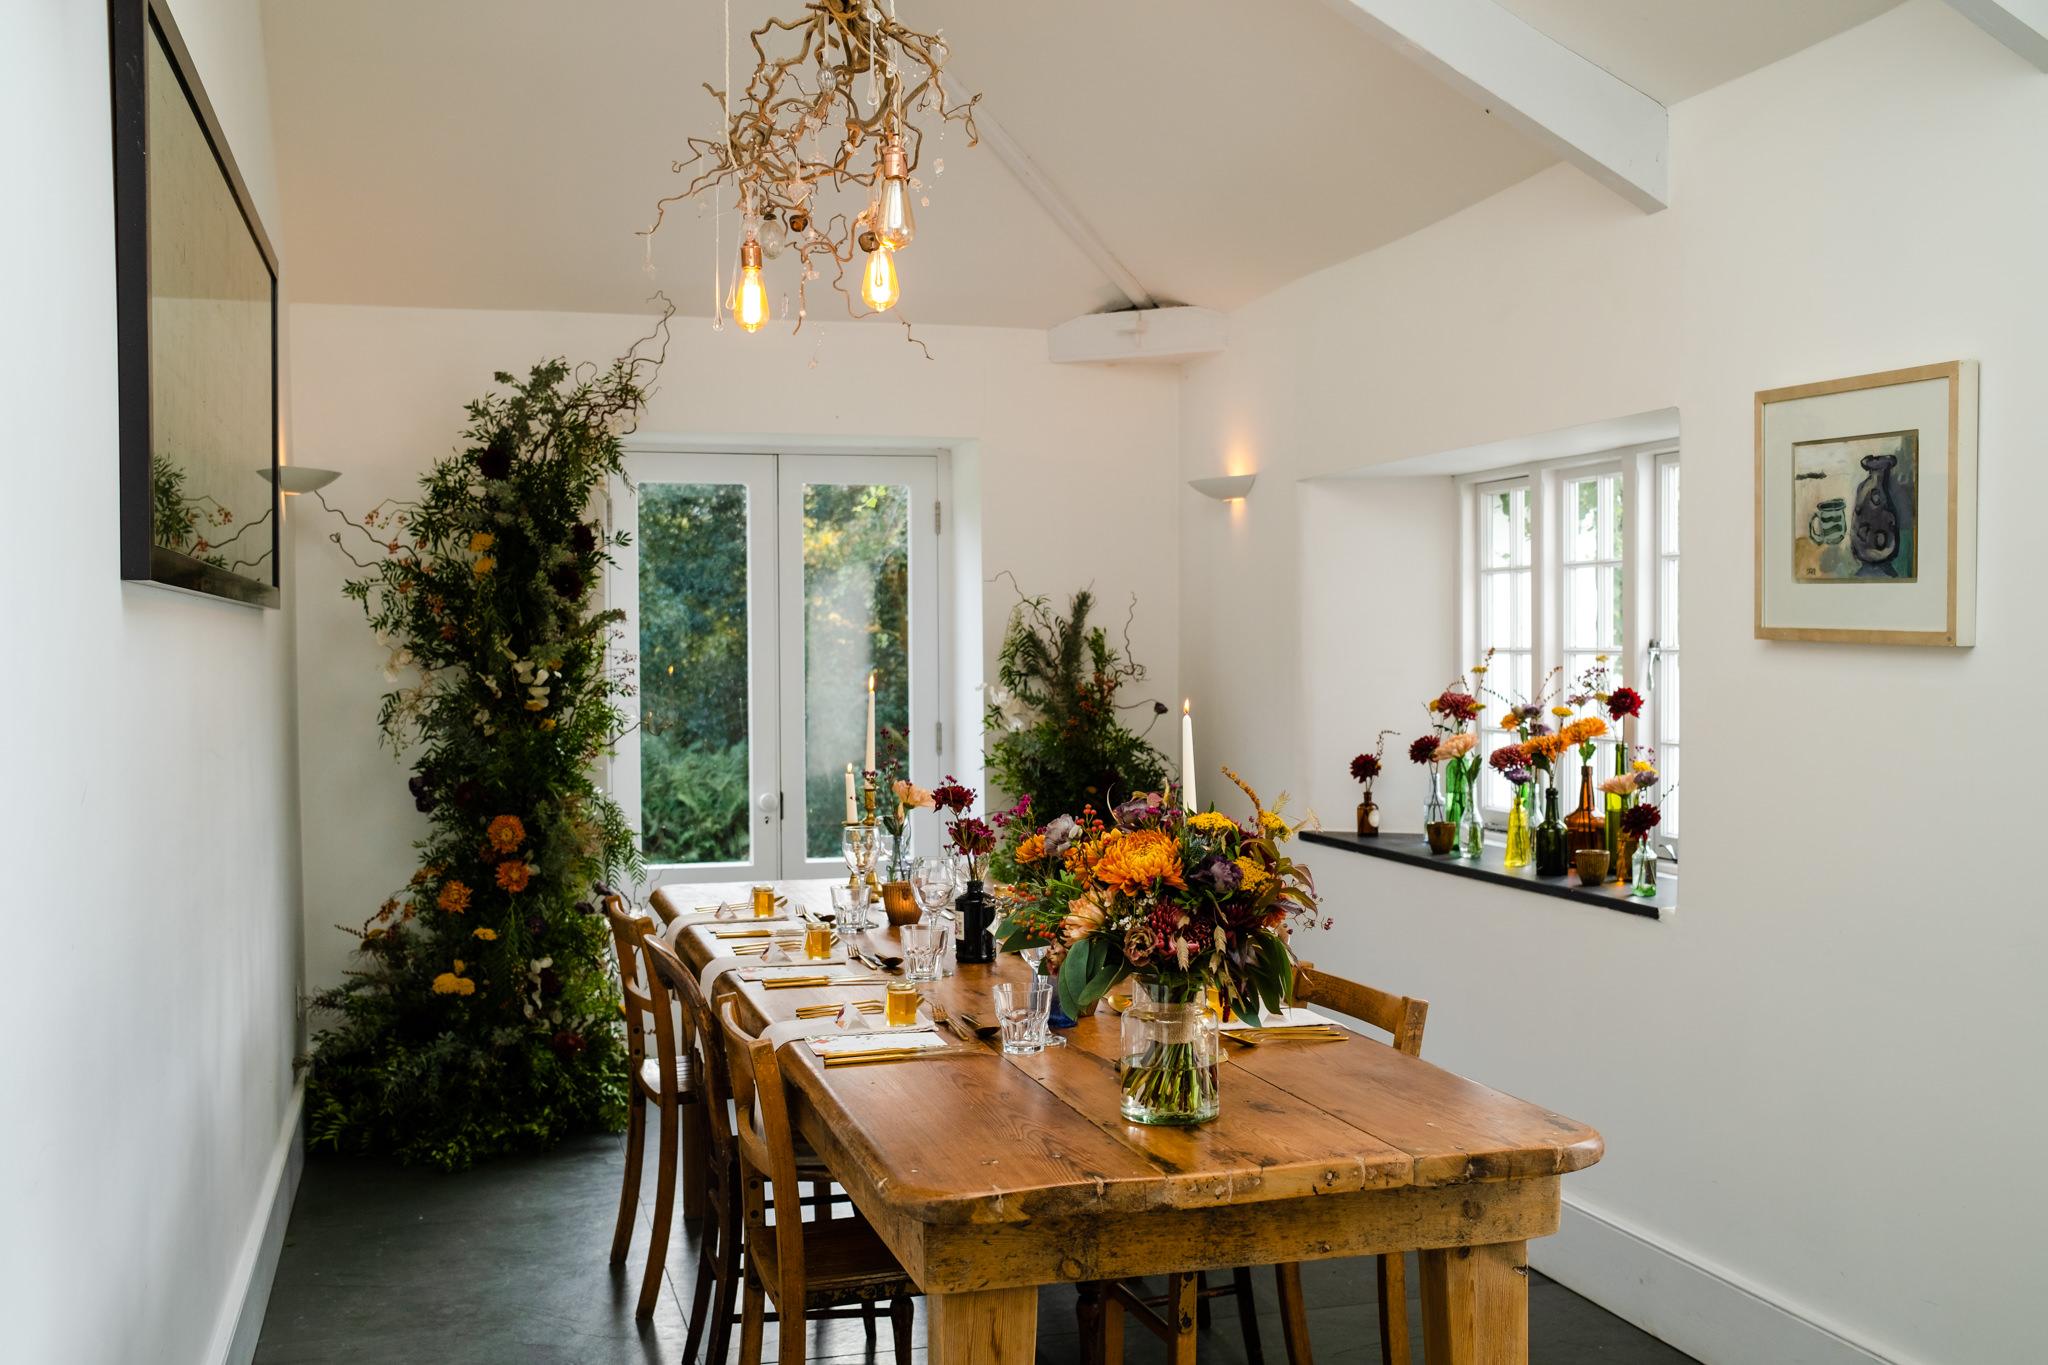 small wedding table for dining setup